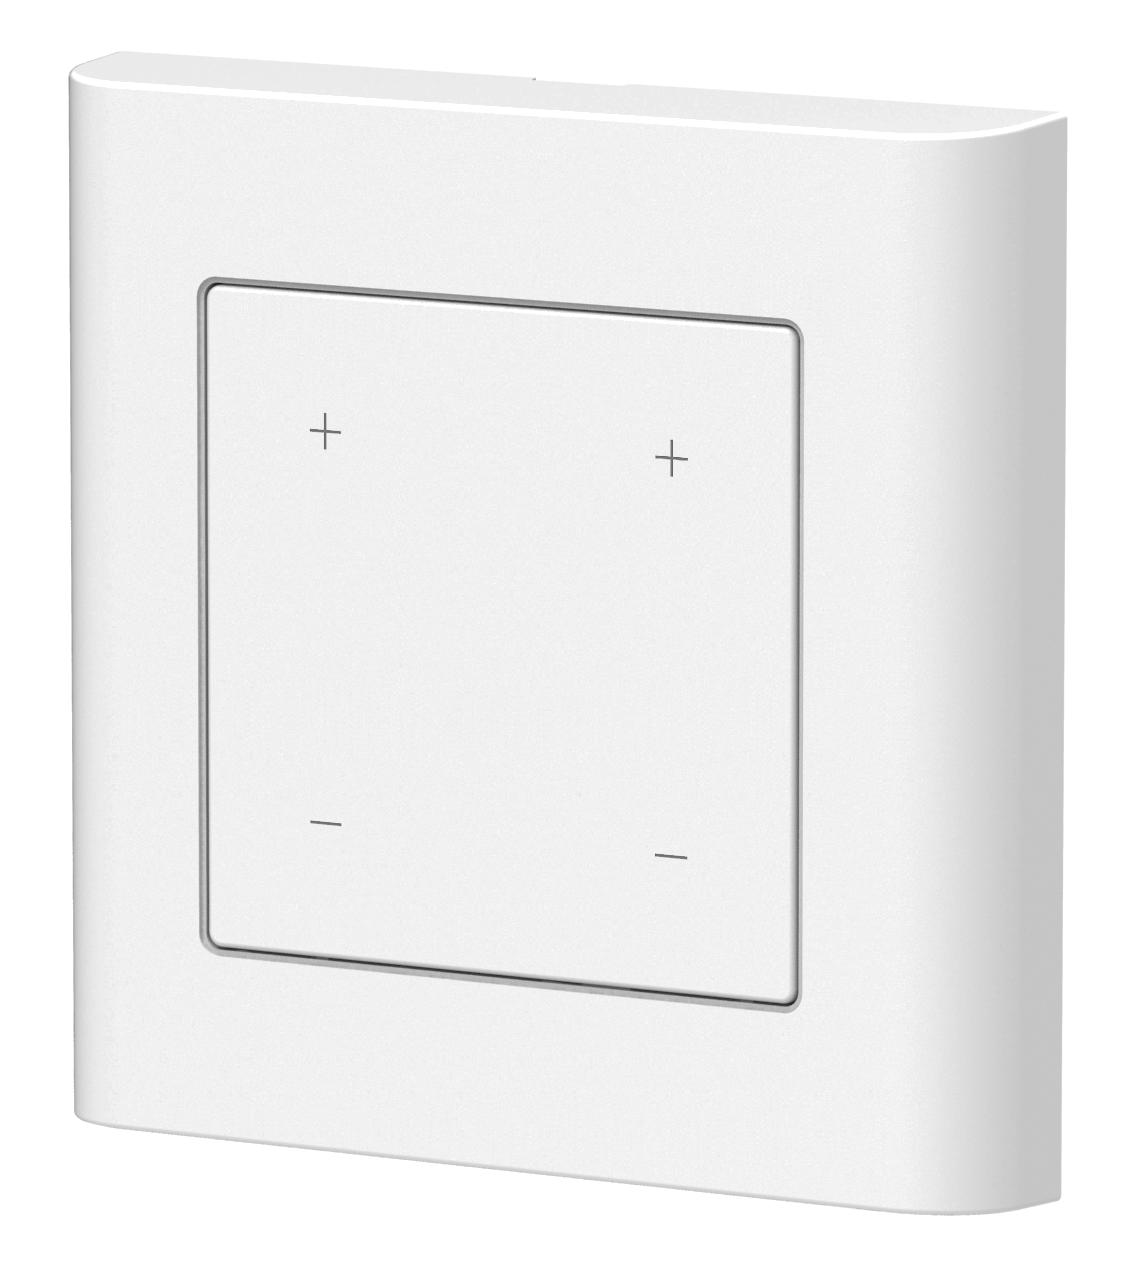 LUPUSEC - Lichtschalter V2